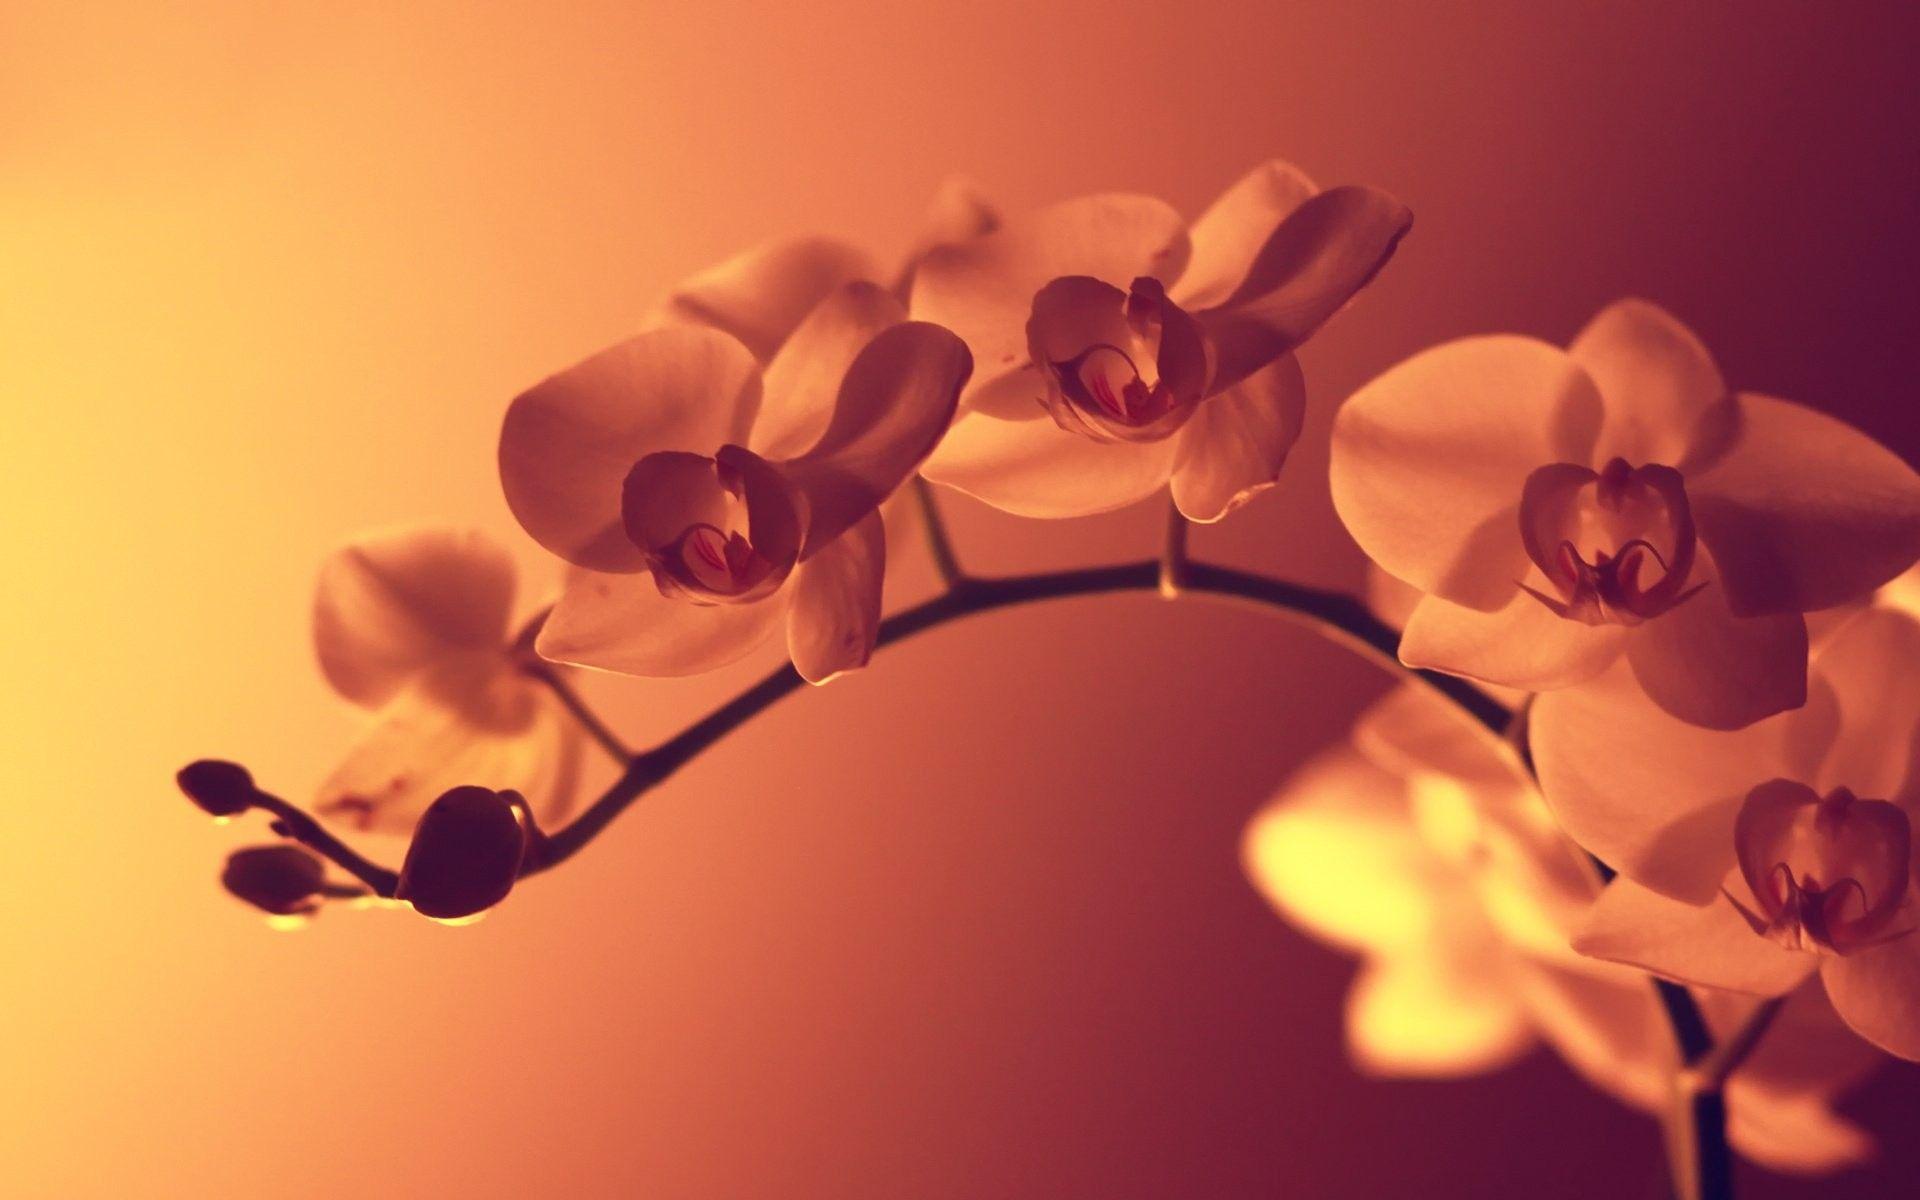 Hd flower wallpaper download 3d hd pictures